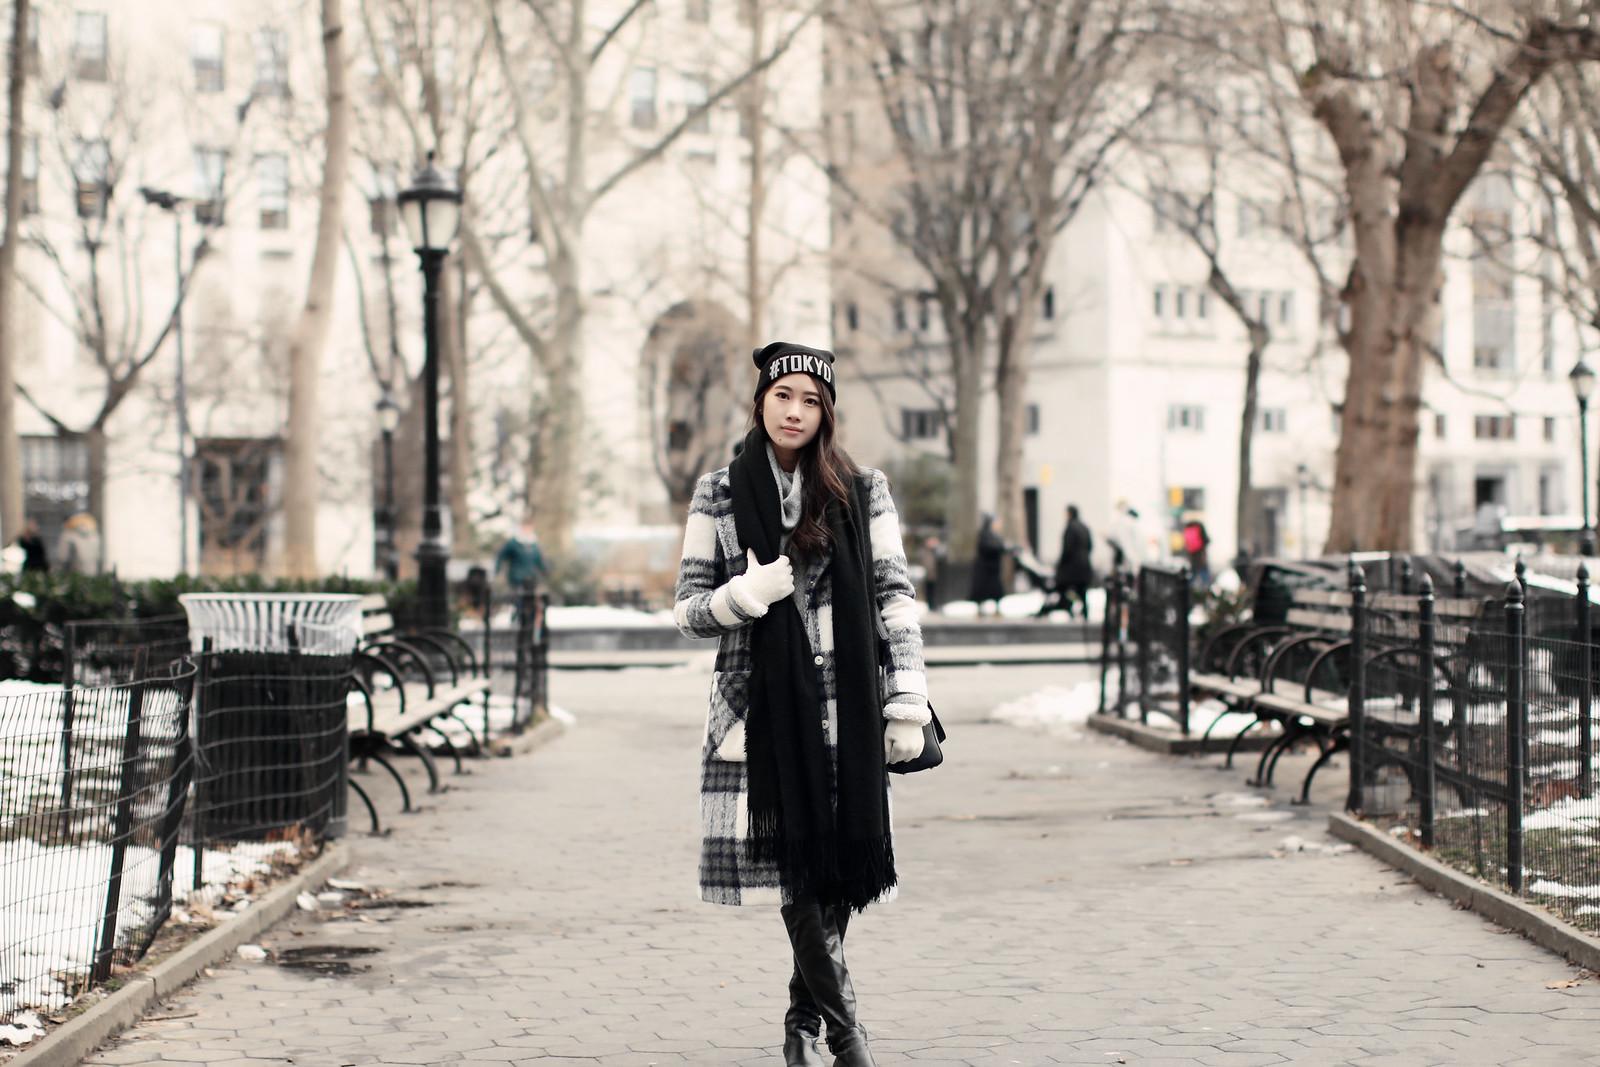 2059-clothestoyouuu-elizabeeetht-nyfw-newyorkfashionweek-nyc-fashionweek-newyork- winter2017-fashion-ootd-style